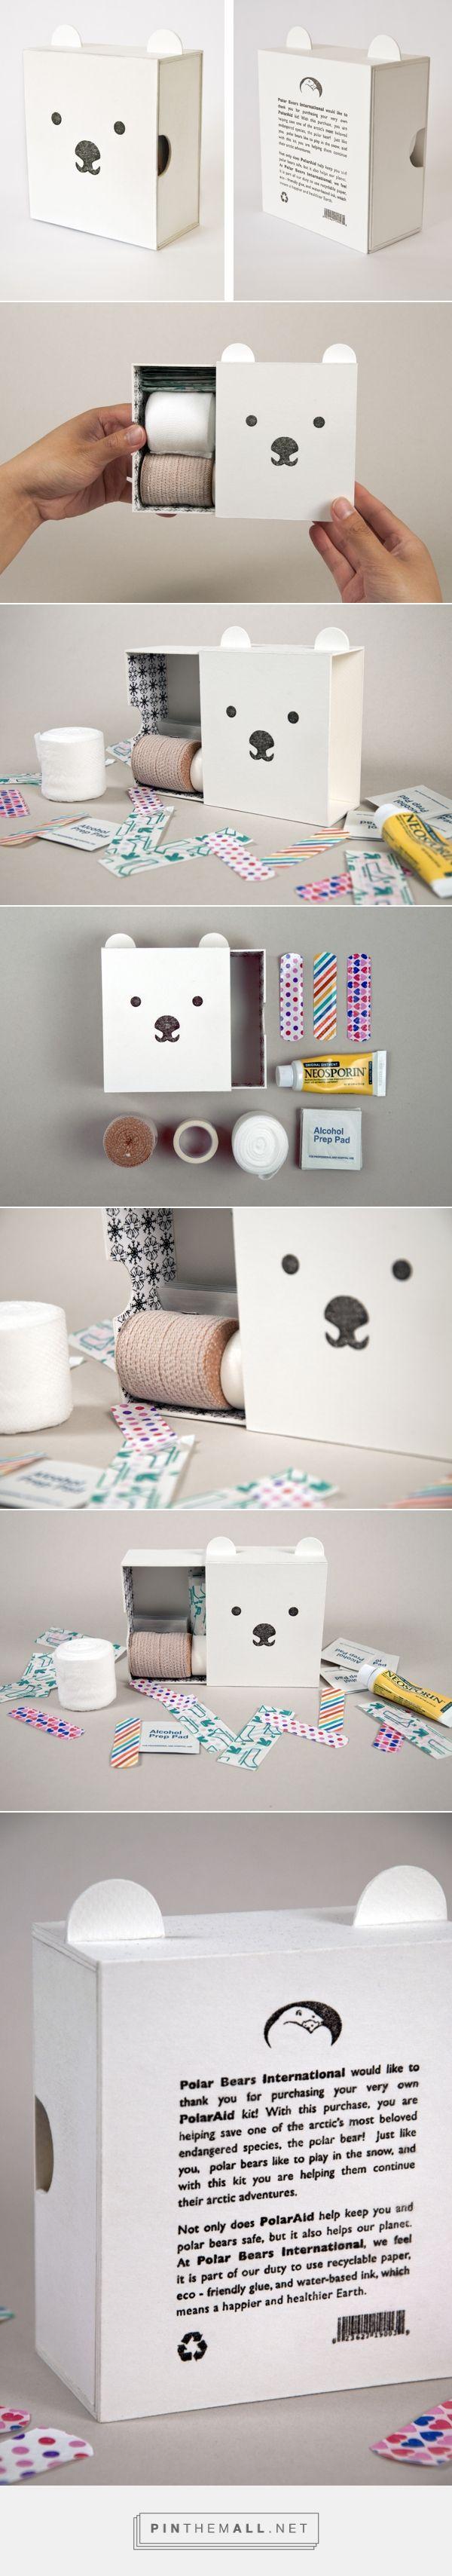 PolarAid Kit /  first aid kit for children